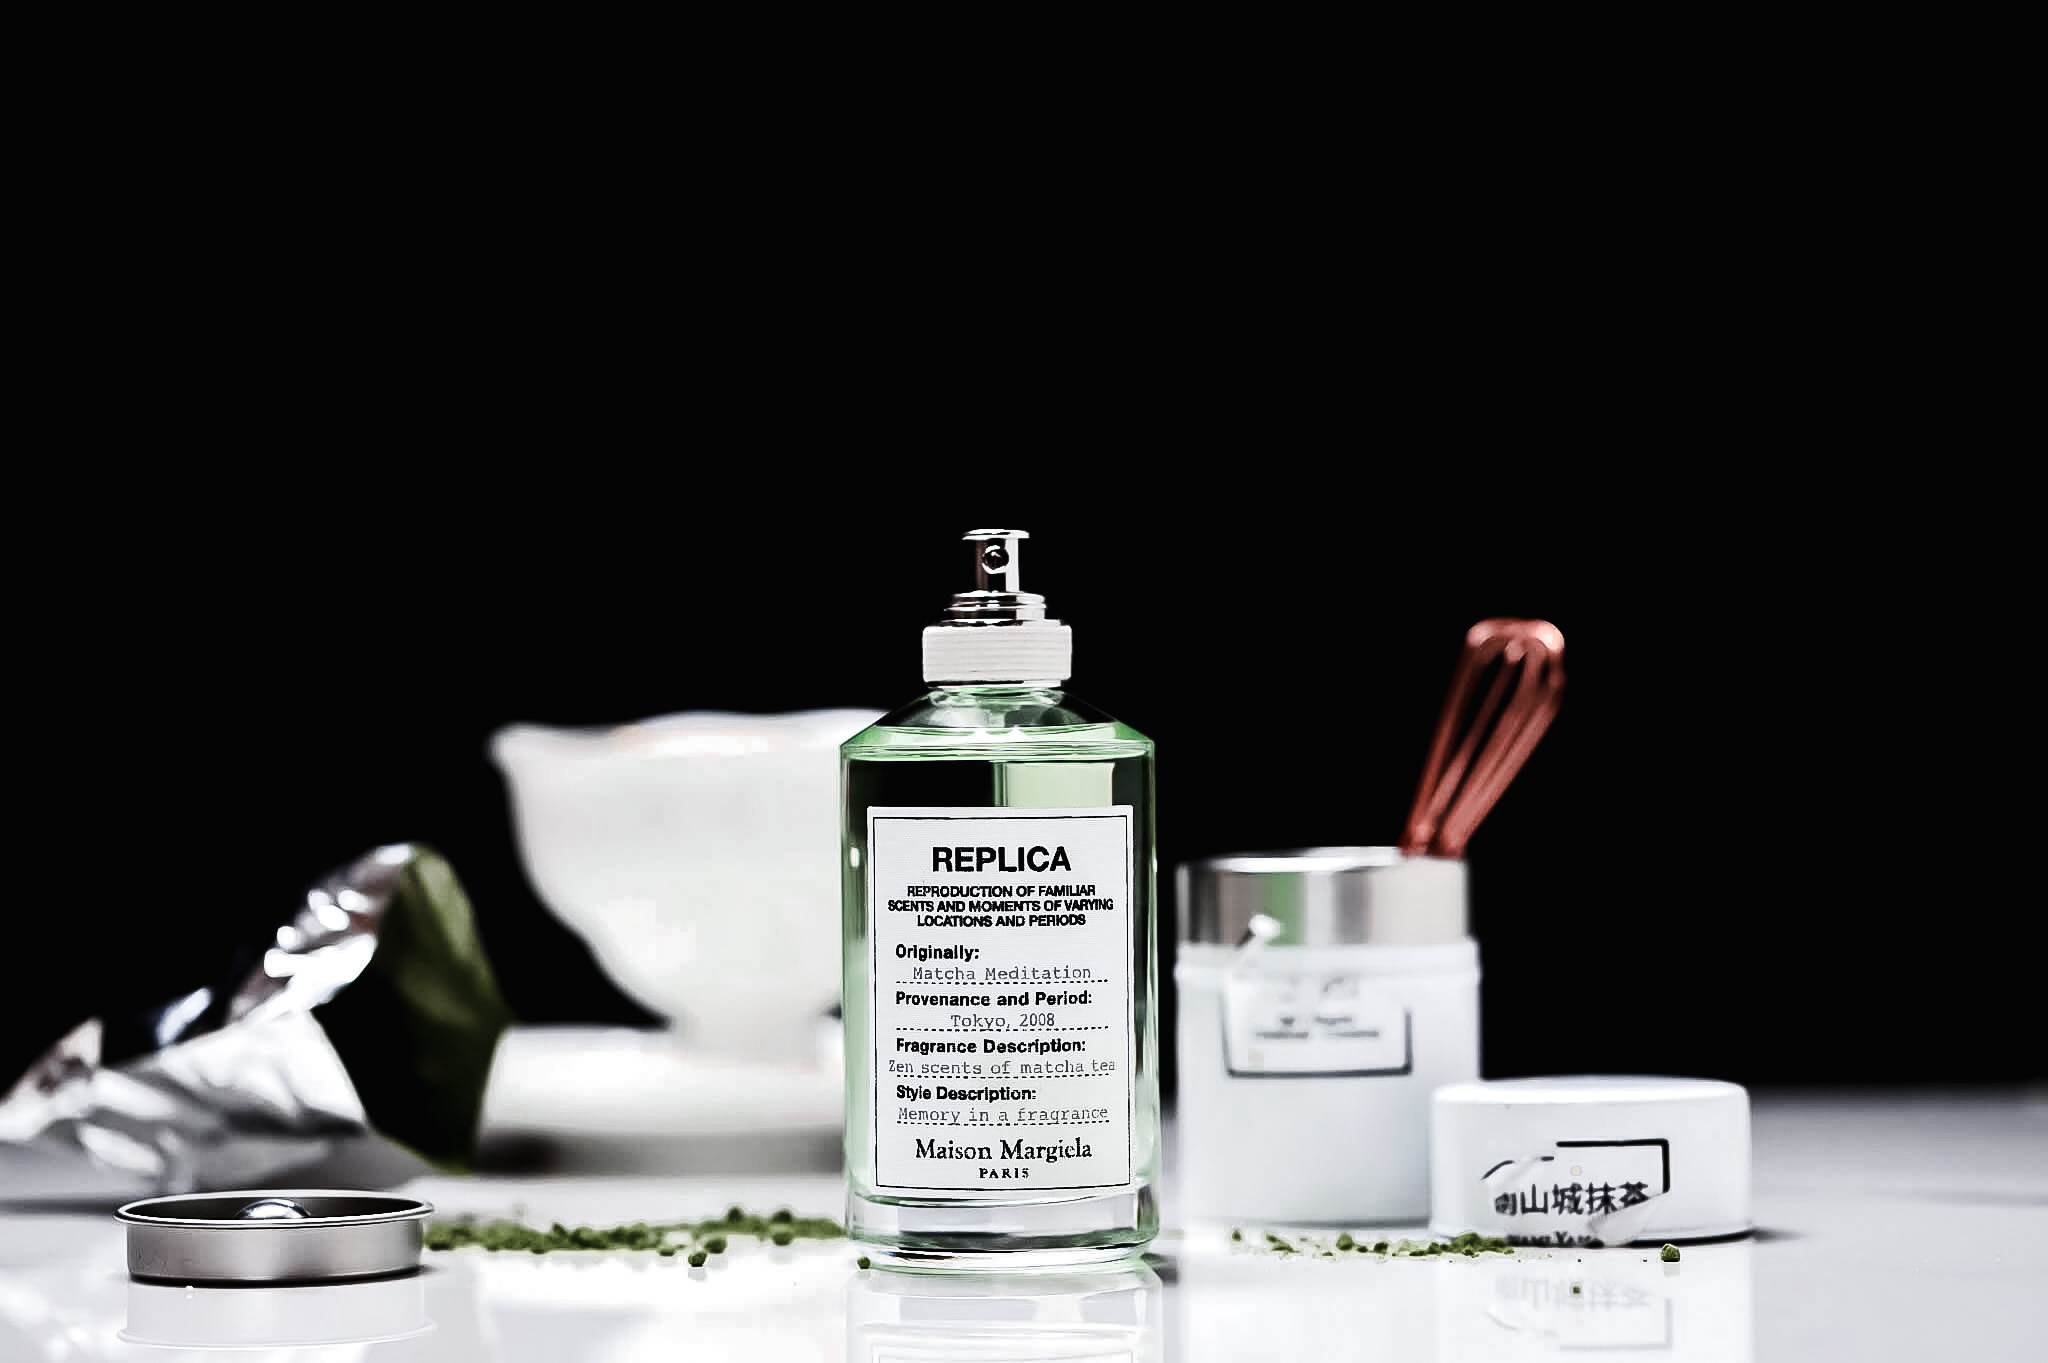 Replica Matcha Meditation Parfum